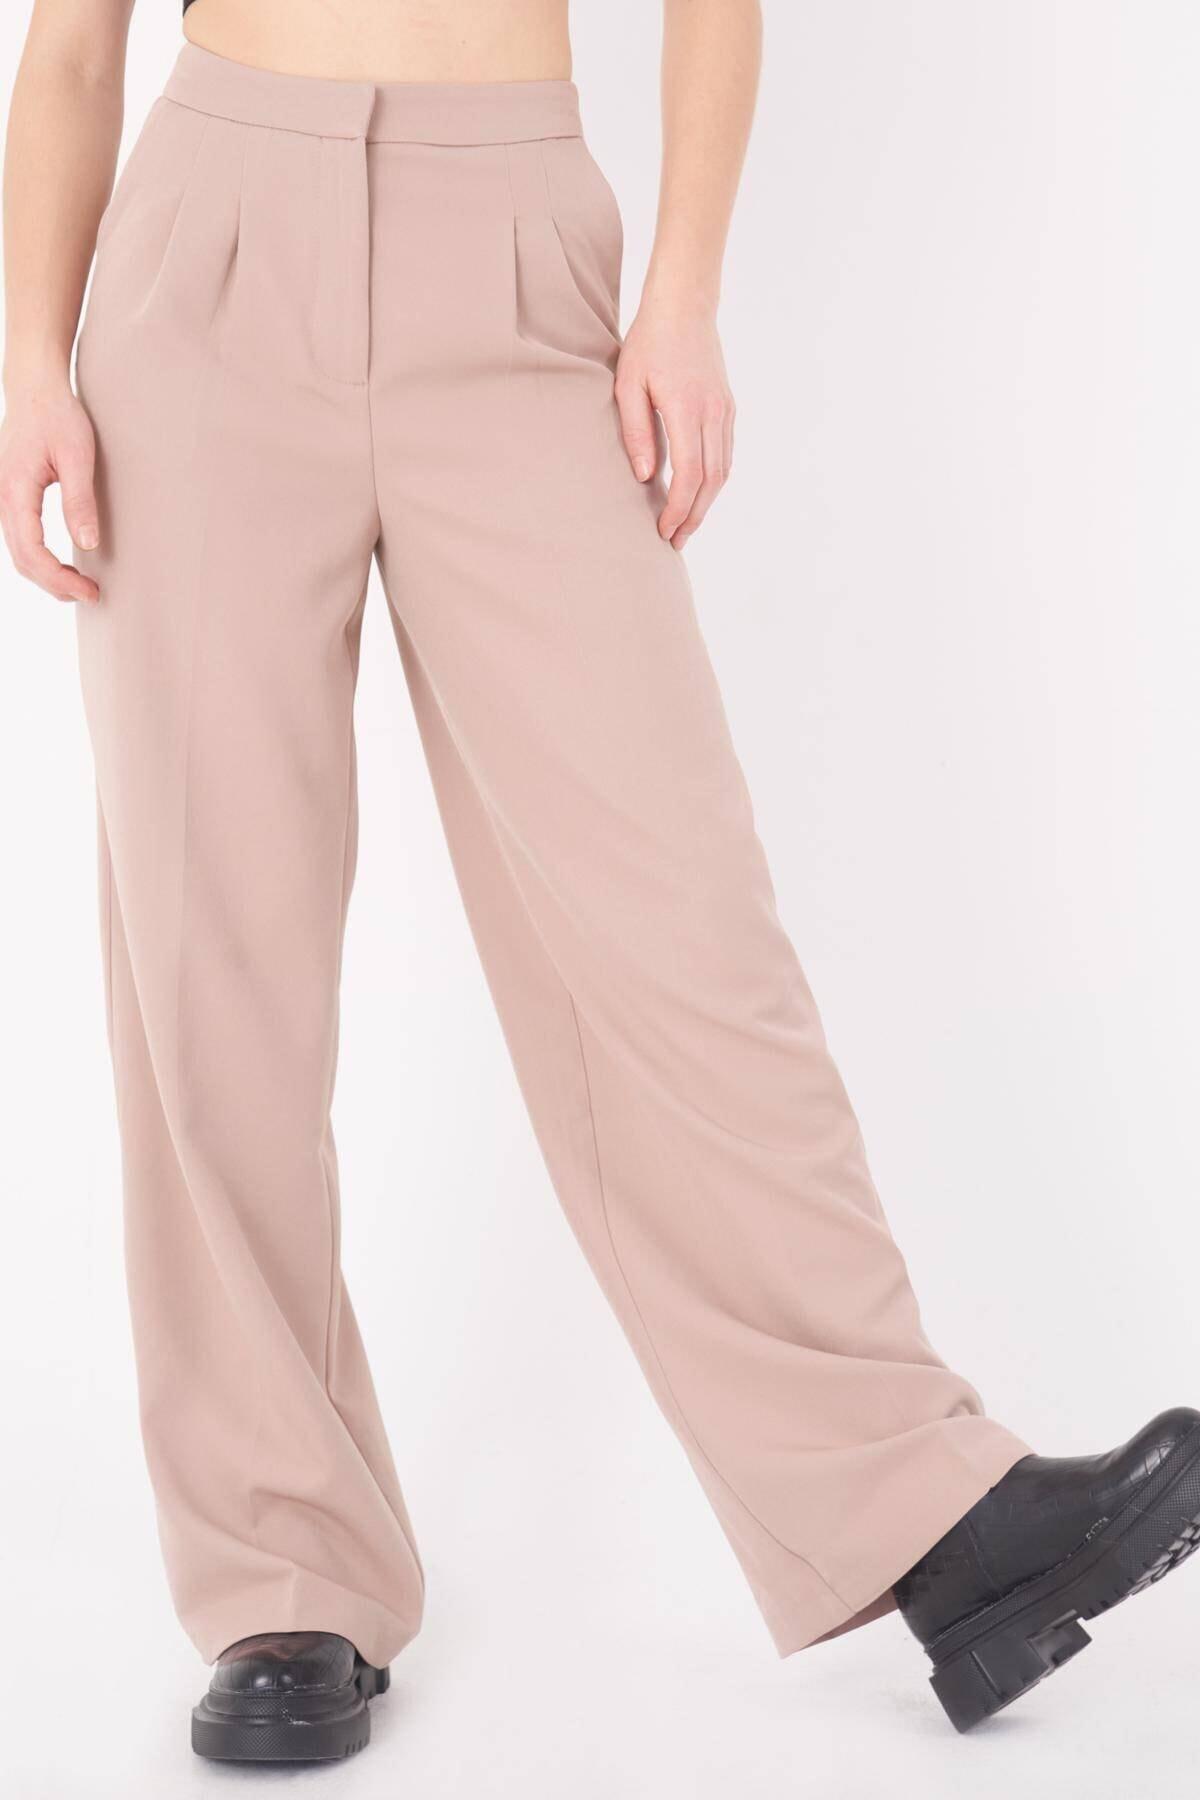 Addax Kadın Bej Cep Detaylı Bol Pantolon PN8058 - E8 ADX-0000023058 4